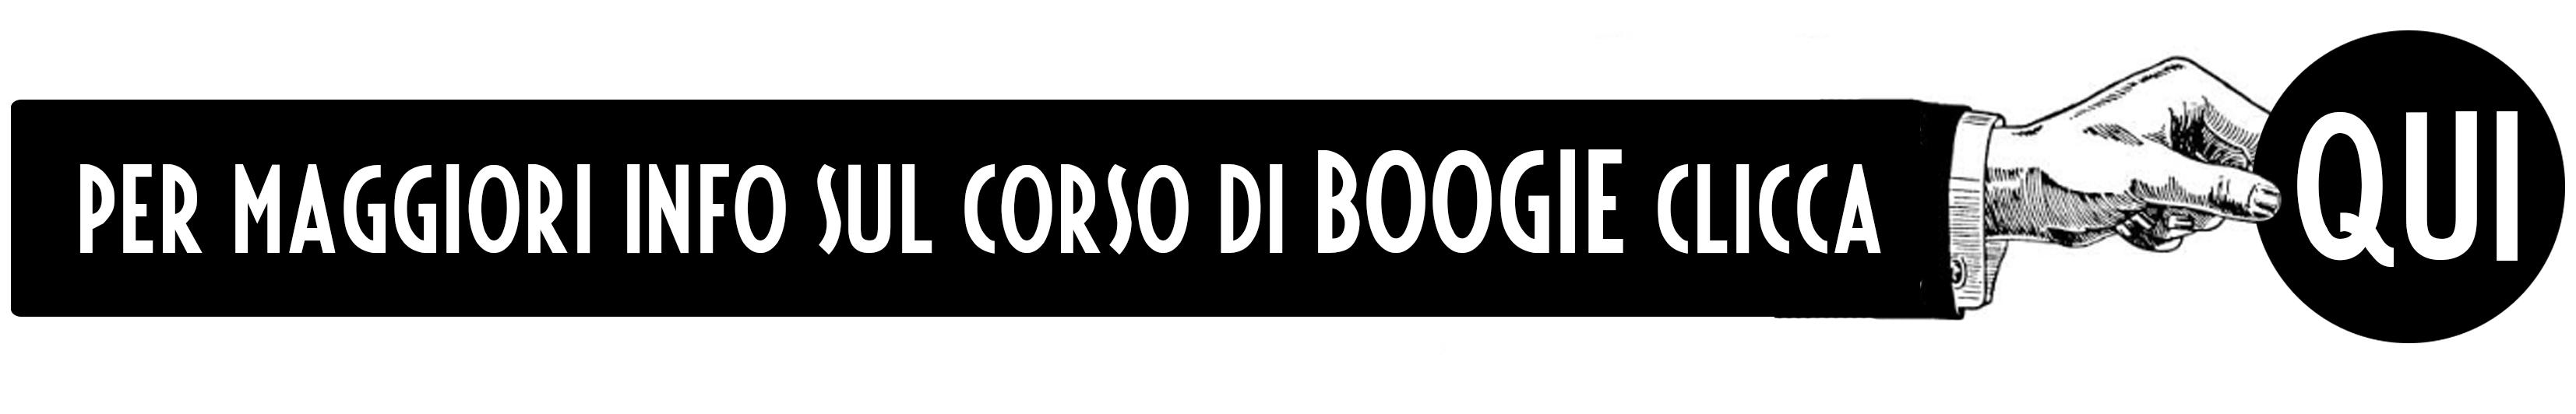 Corsi-info BOOGIE